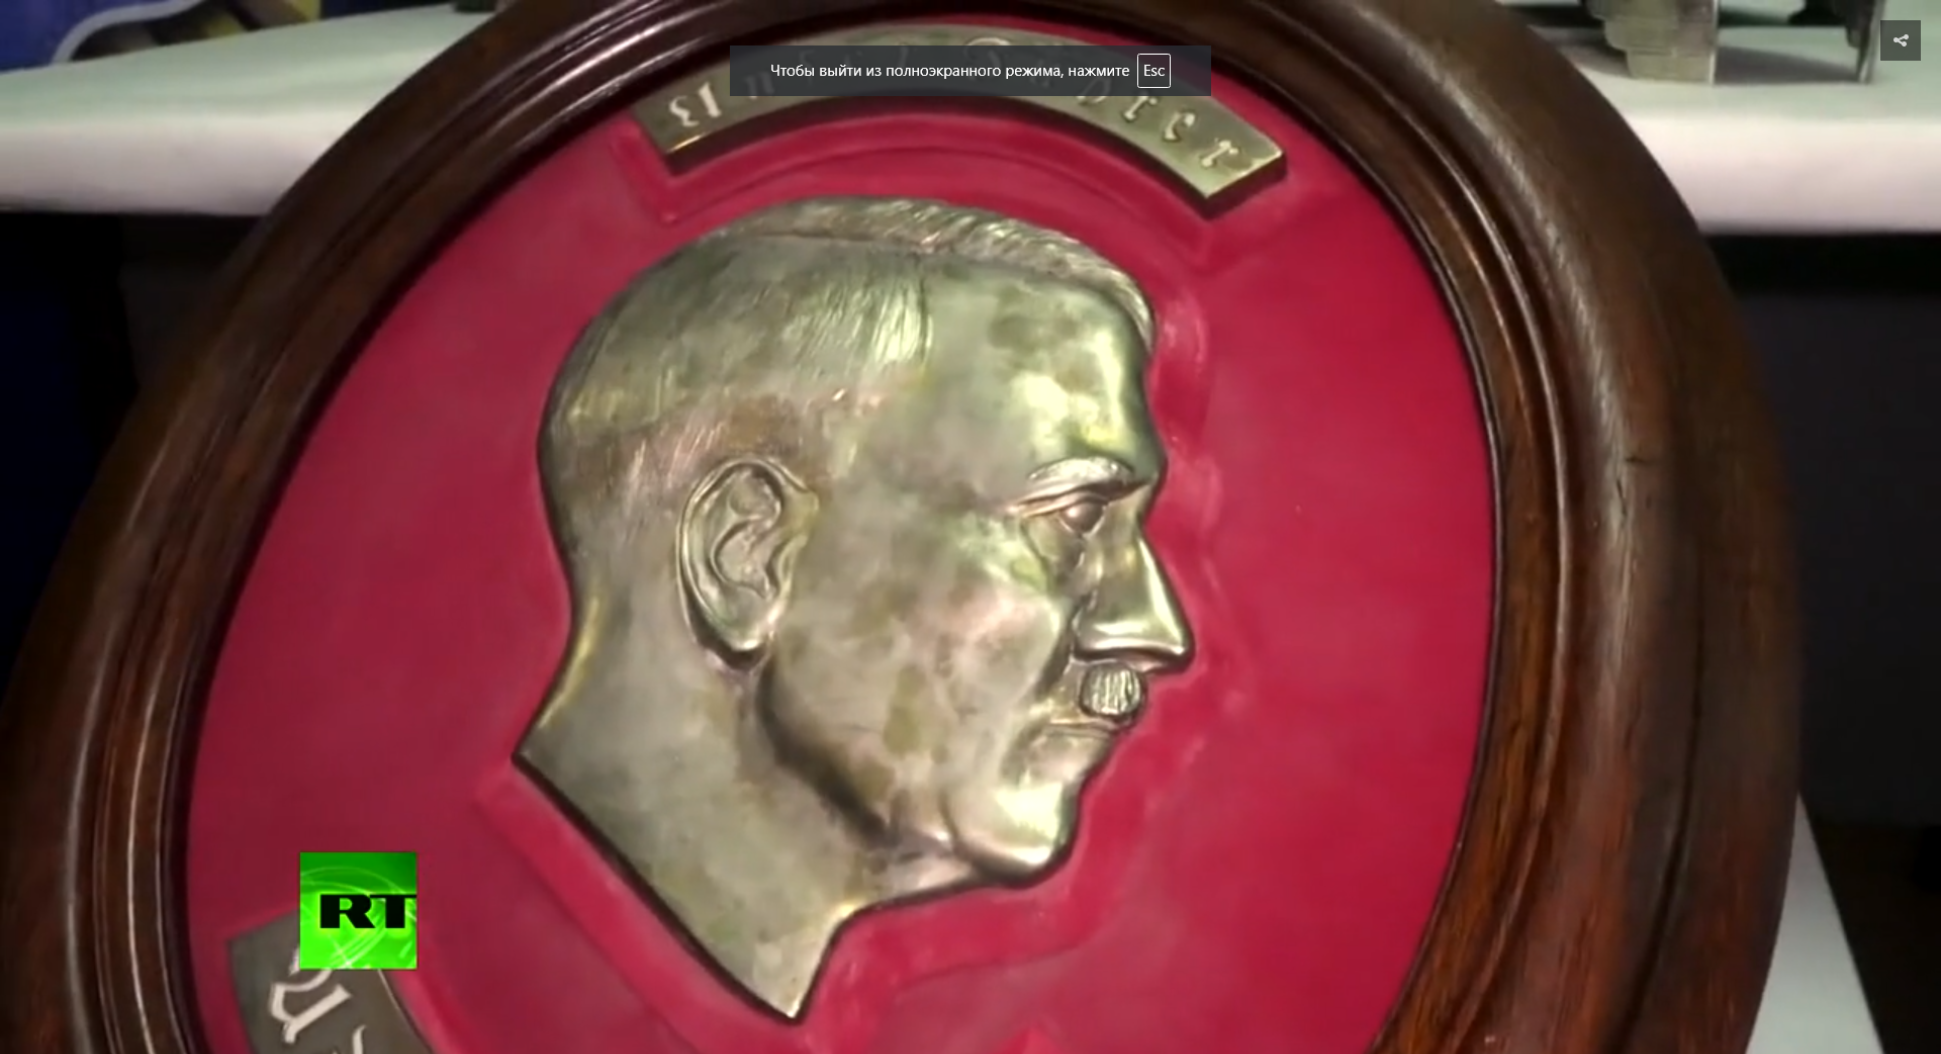 Relics of World War II found in Argentina.